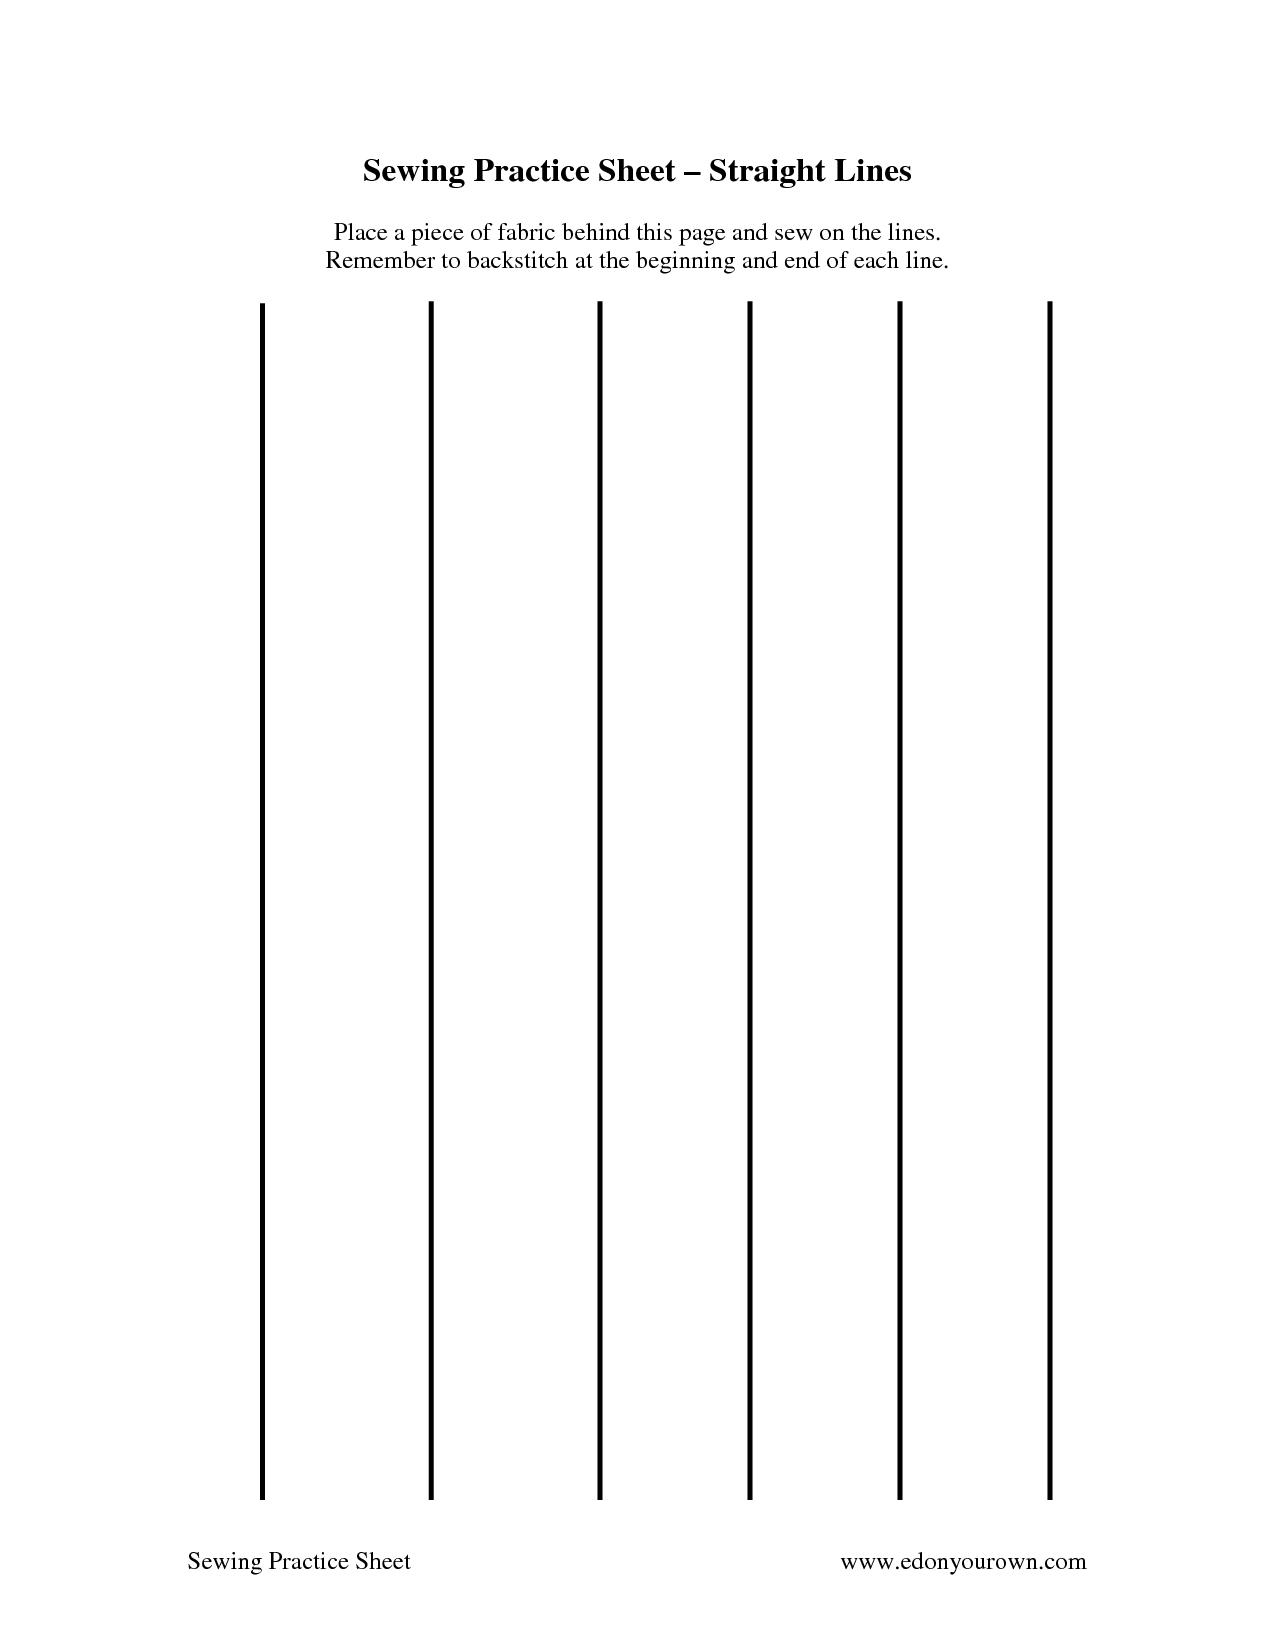 sewing machine parts diagram worksheet 1998 club car golf cart wiring 9 best images of worksheets printable